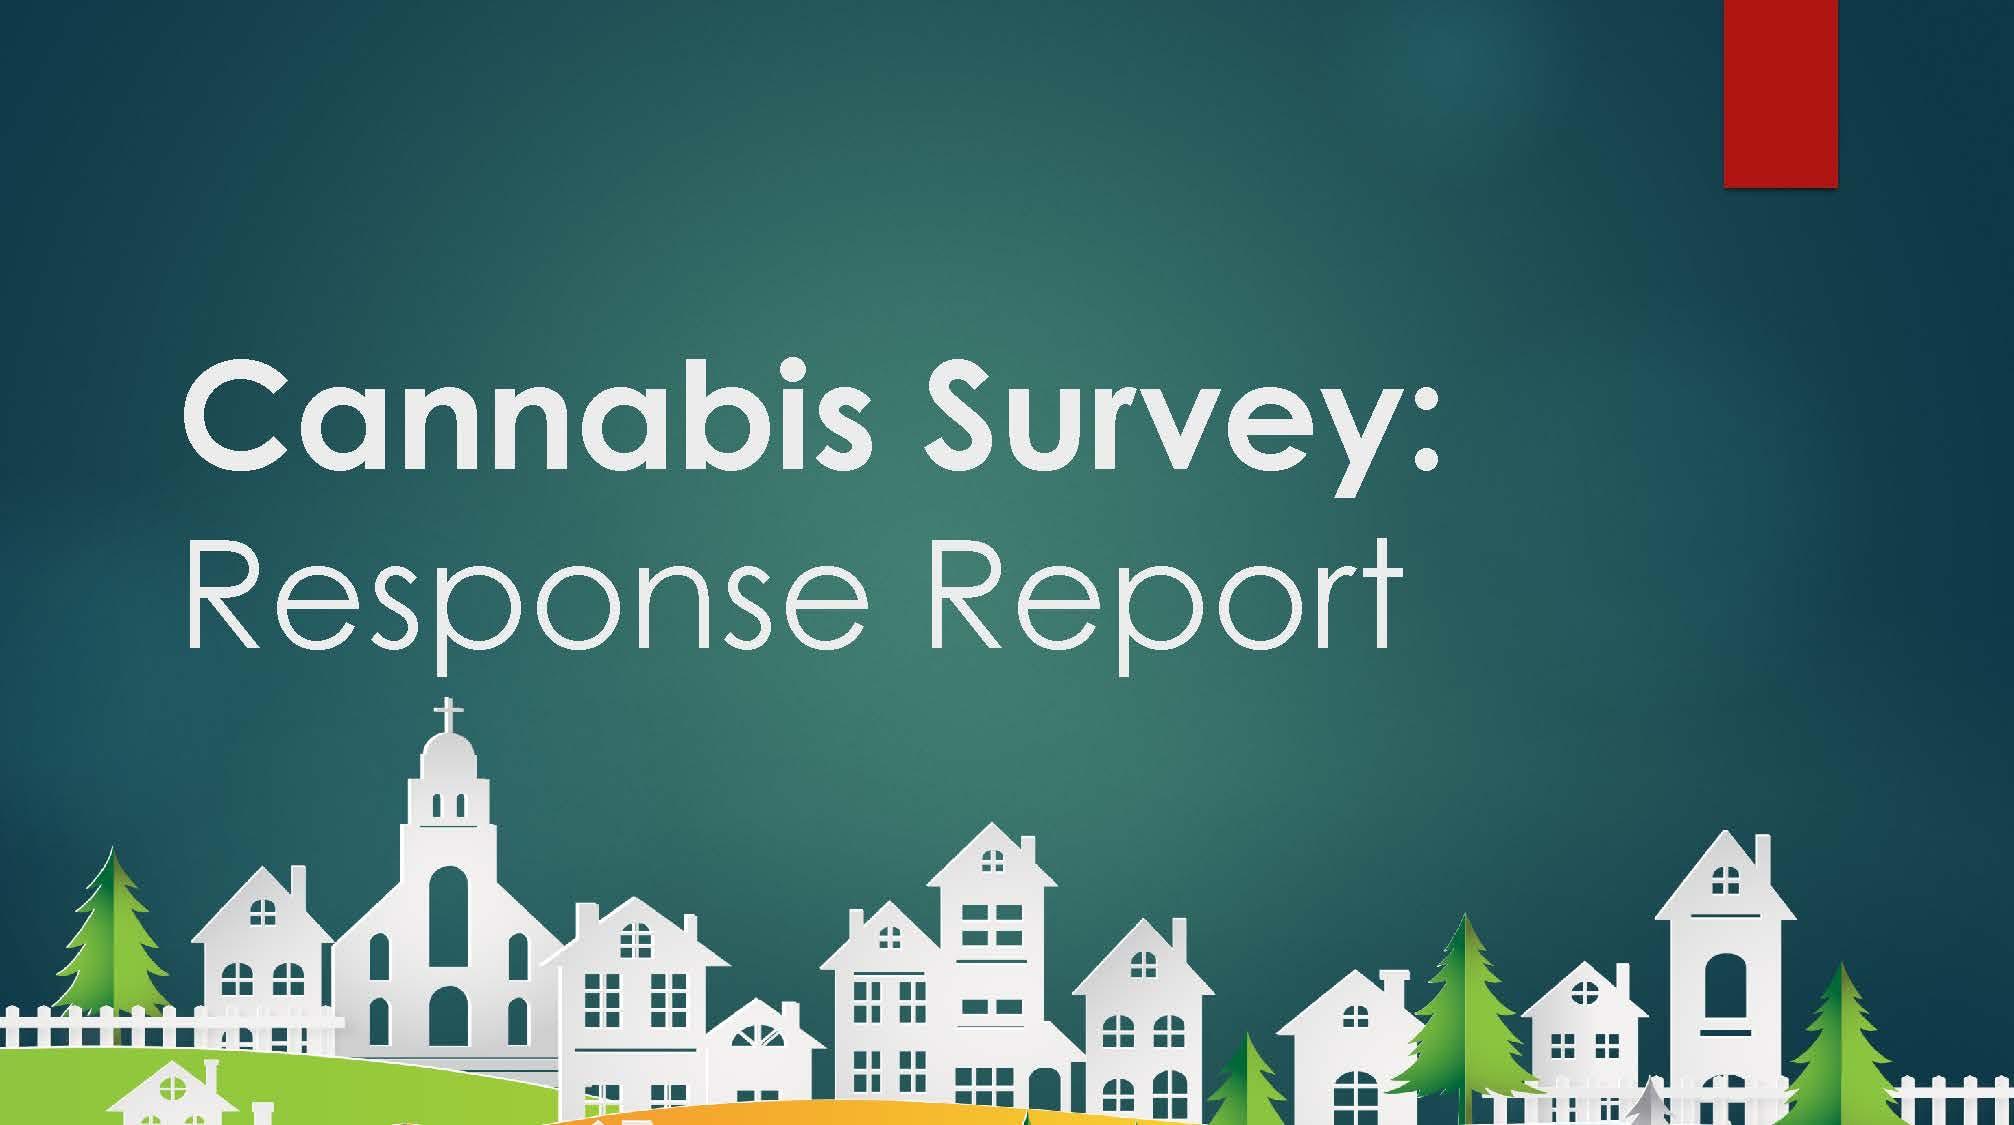 Cannabis Survey Response Report Page 1